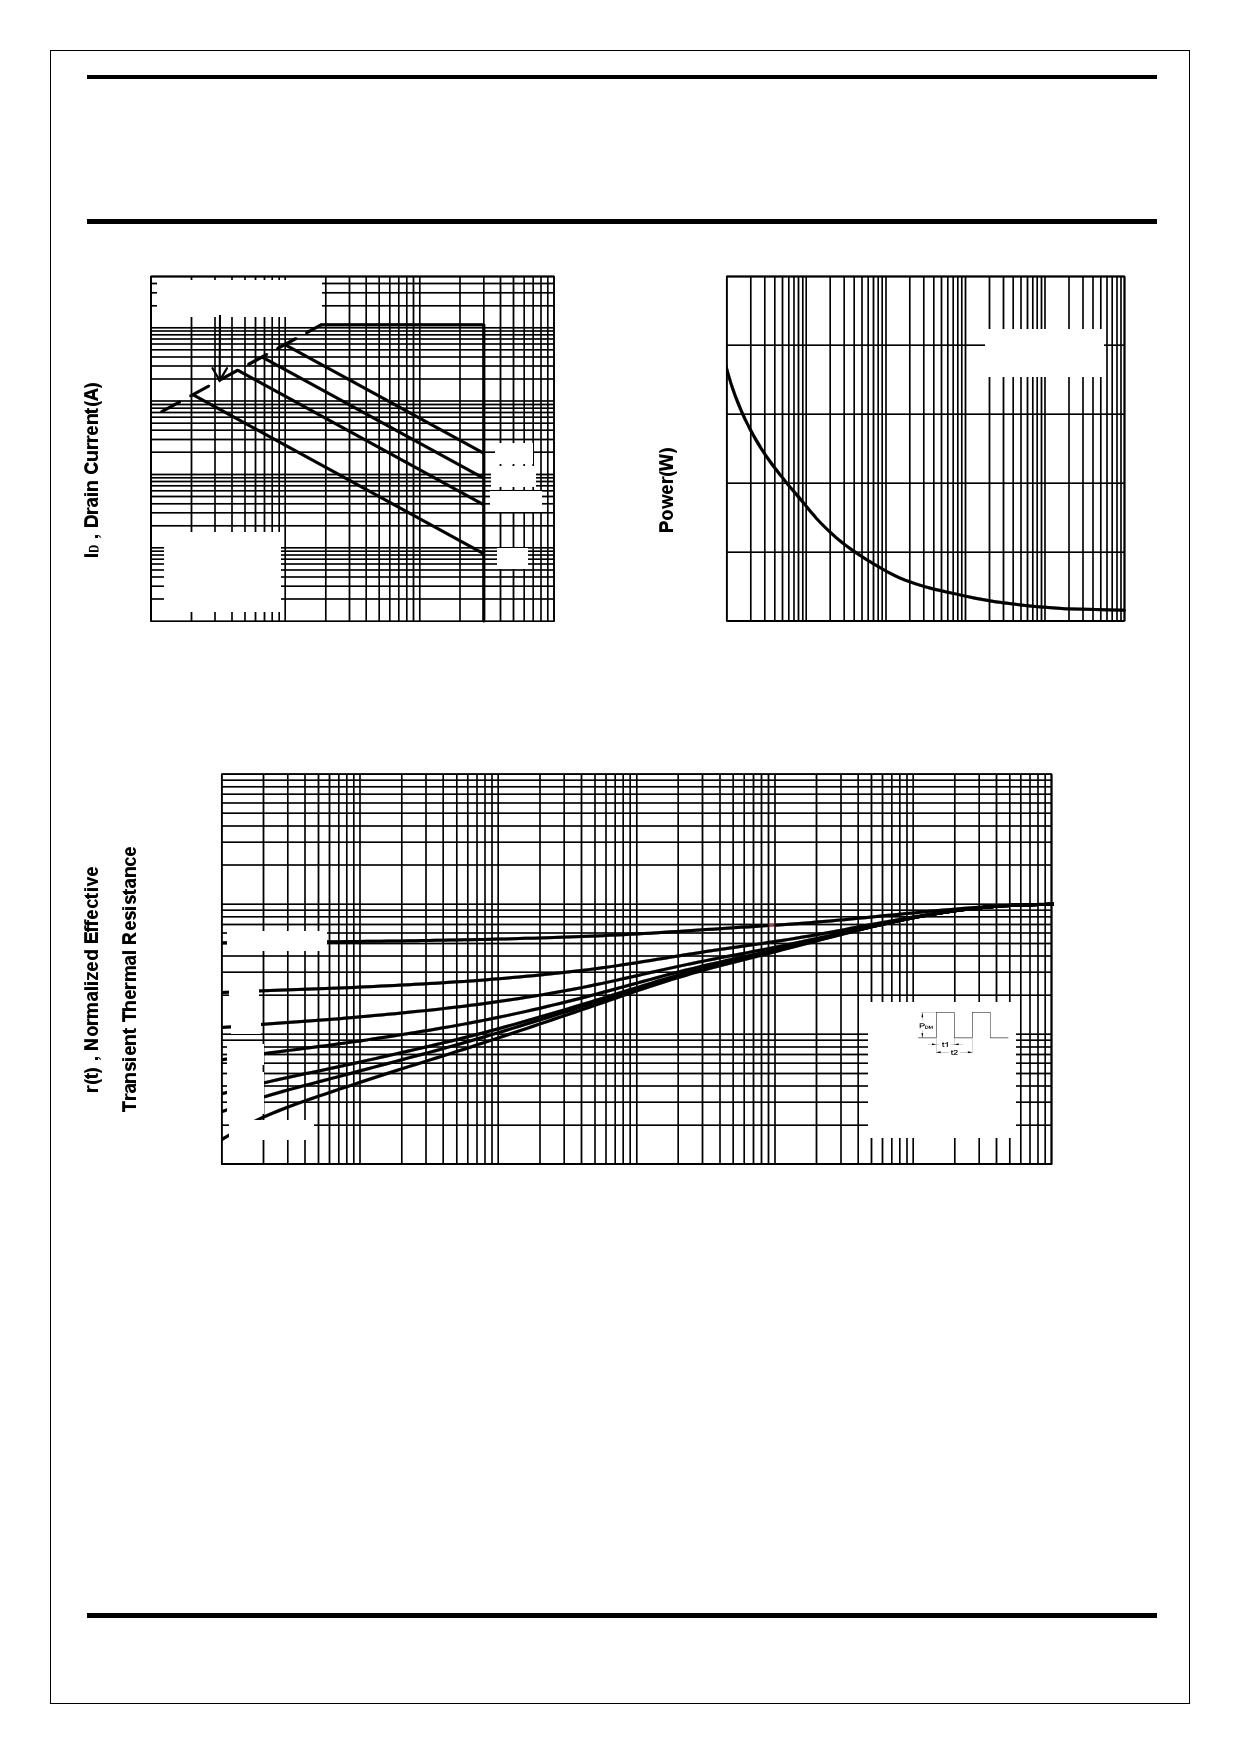 P1003BKA pdf, 반도체, 판매, 대치품